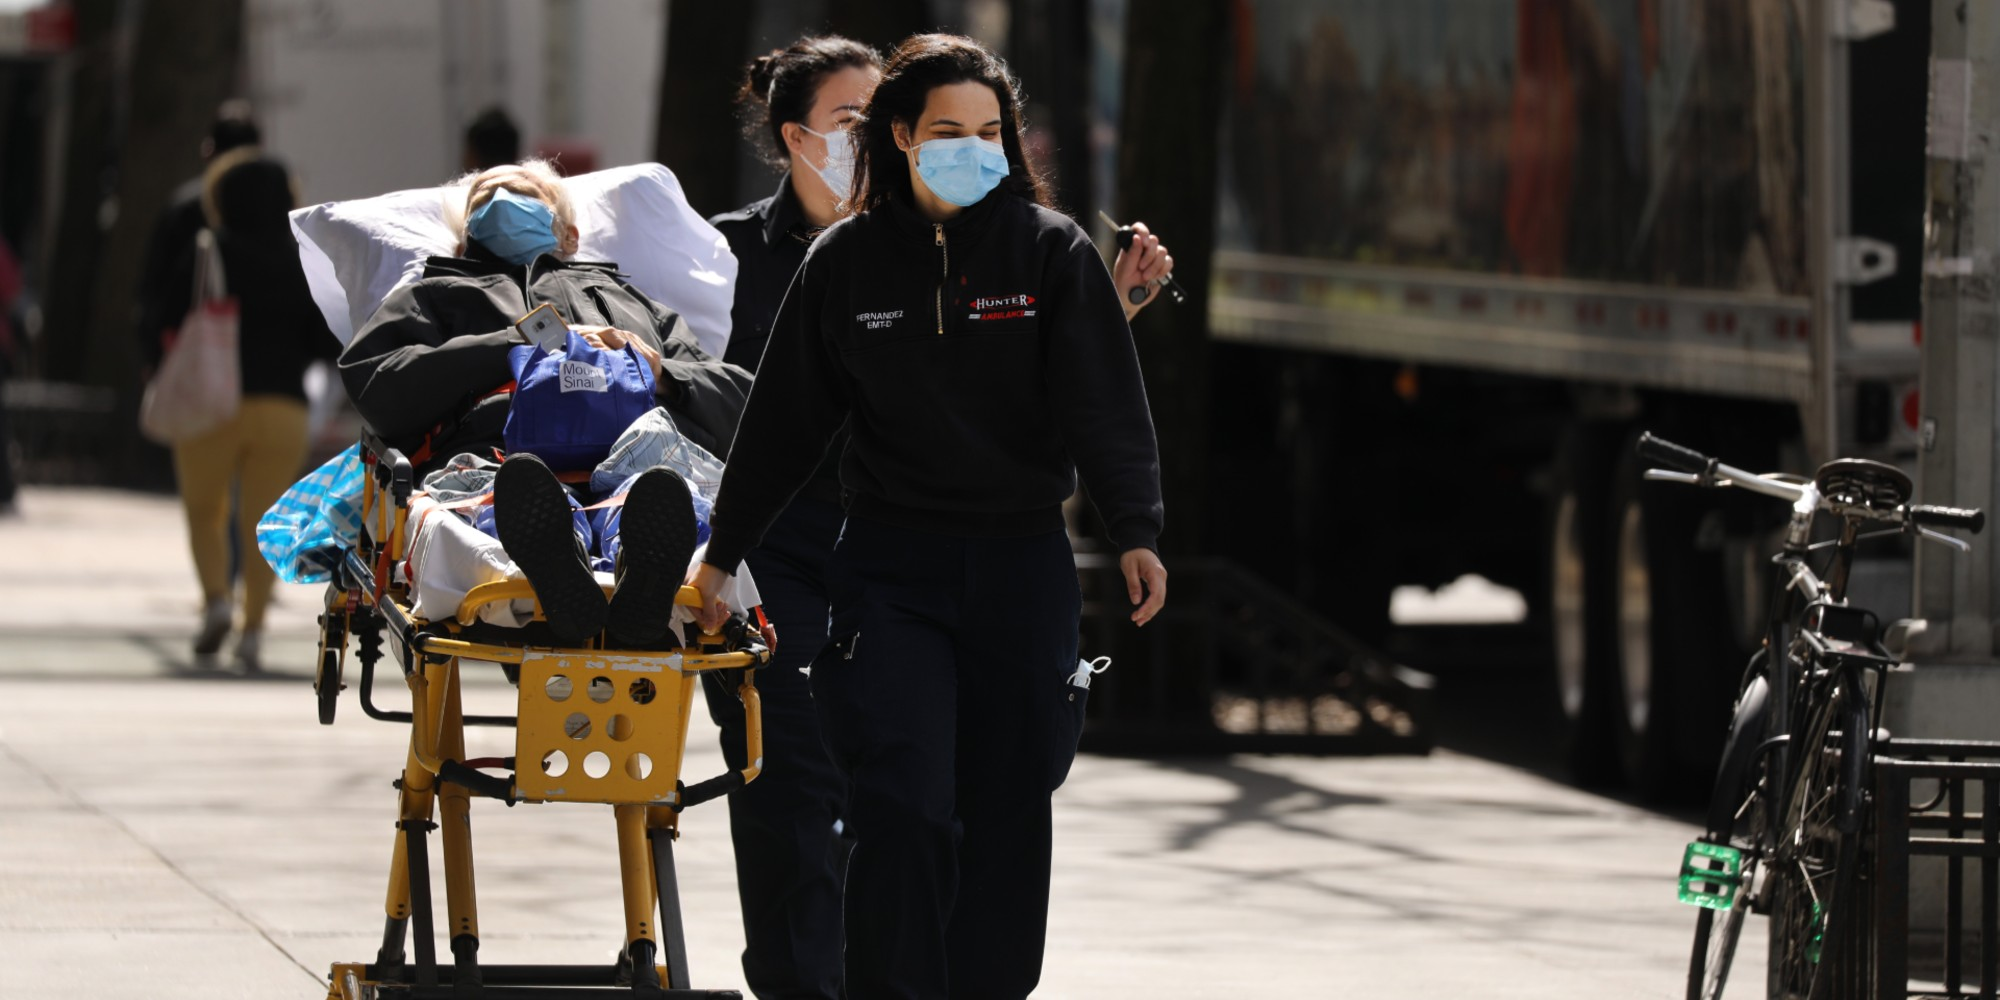 Coronavirus : plus de 5.000 morts aux Etats-Unis